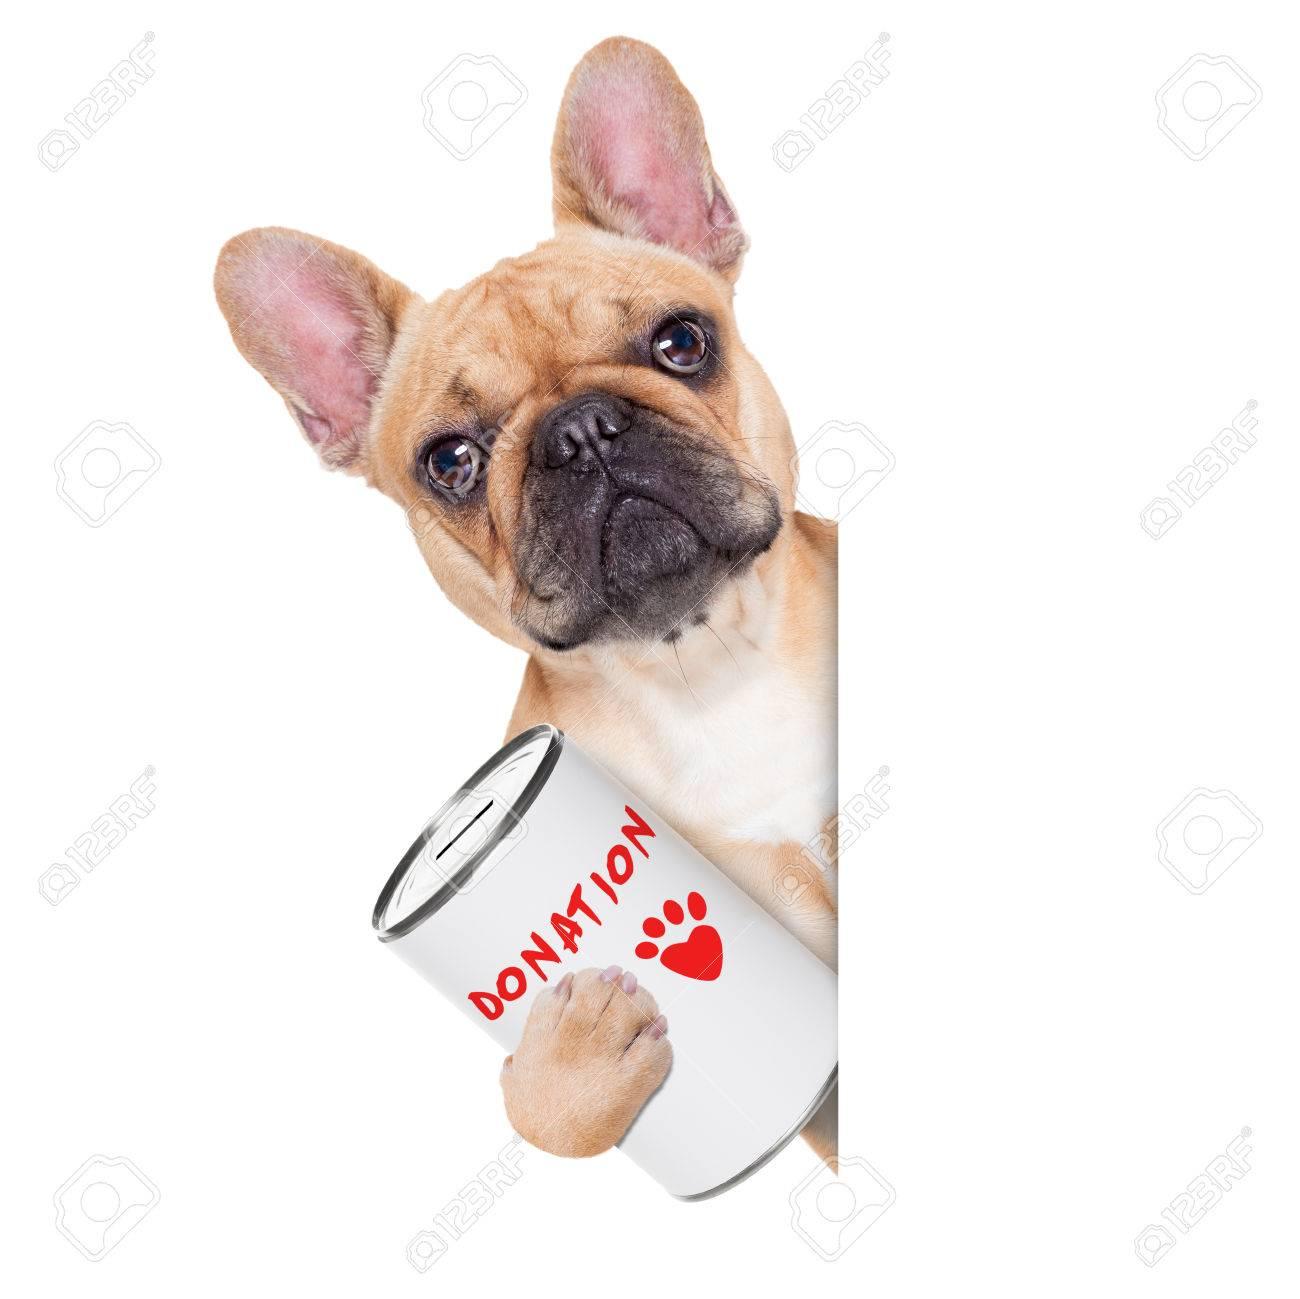 Image result for Hond met geld